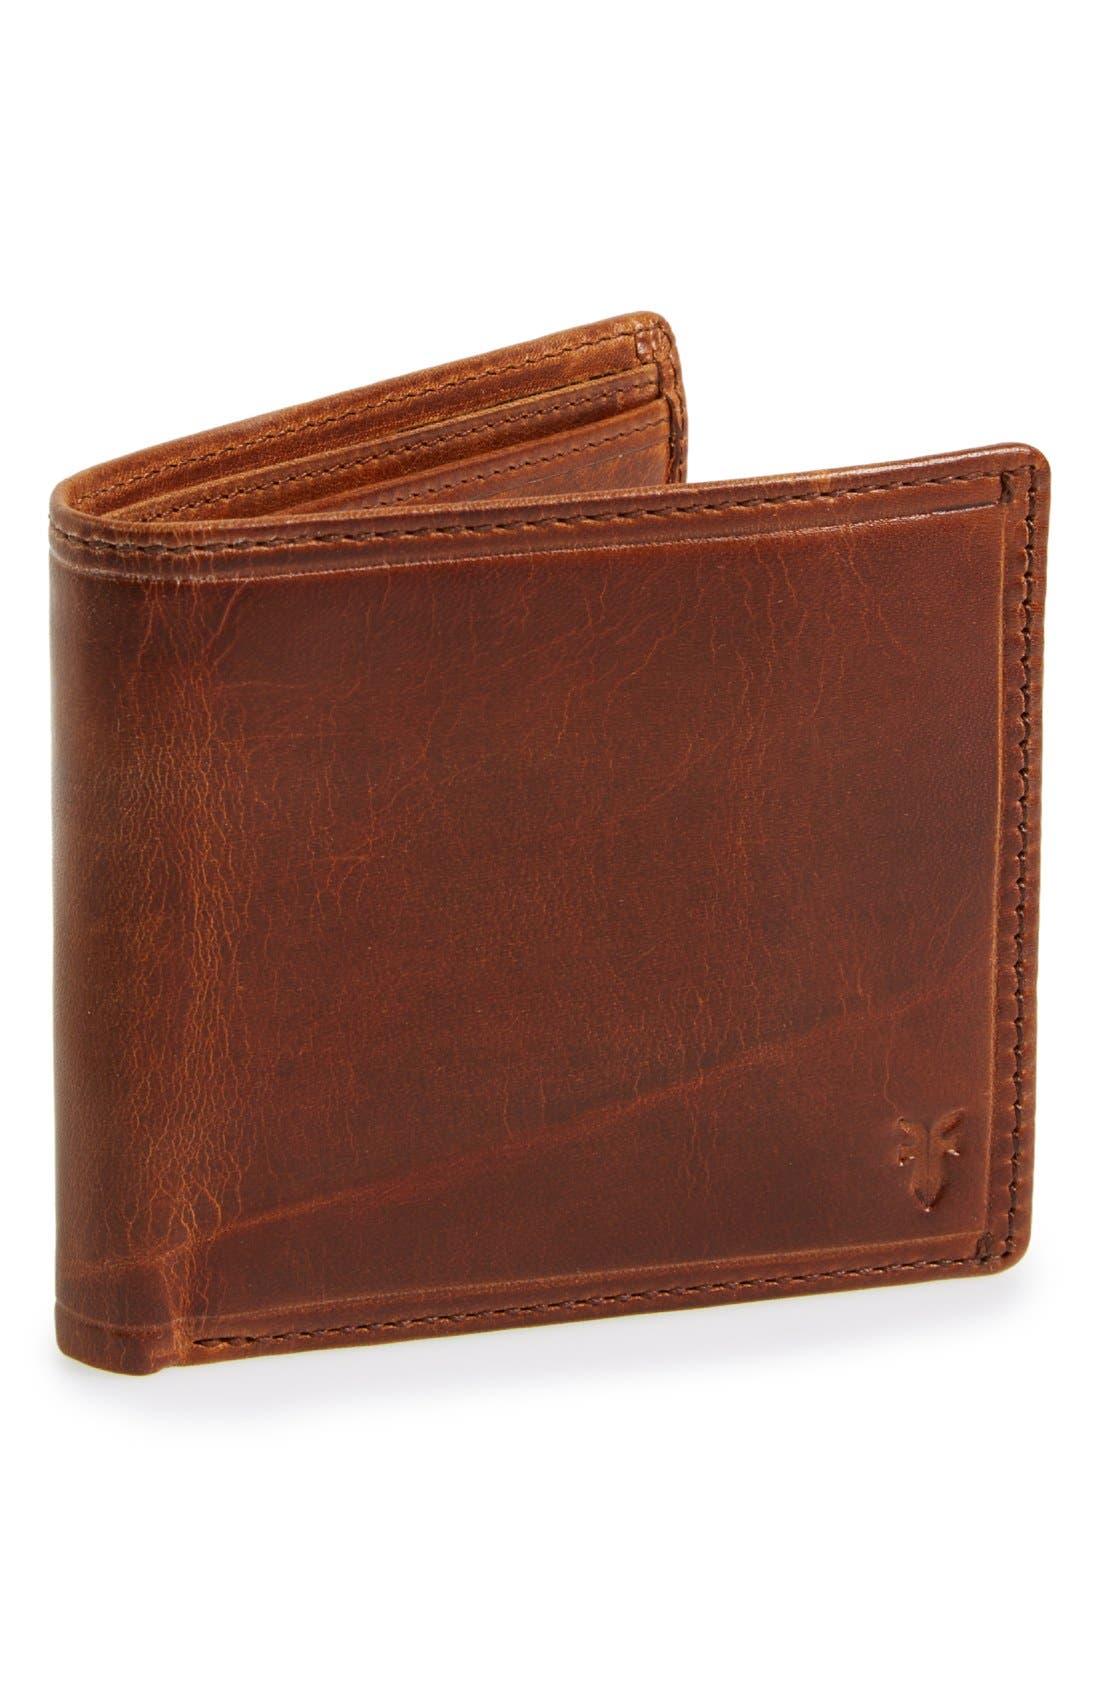 FRYE, 'Logan' Leather Billfold Wallet, Main thumbnail 1, color, COGNAC